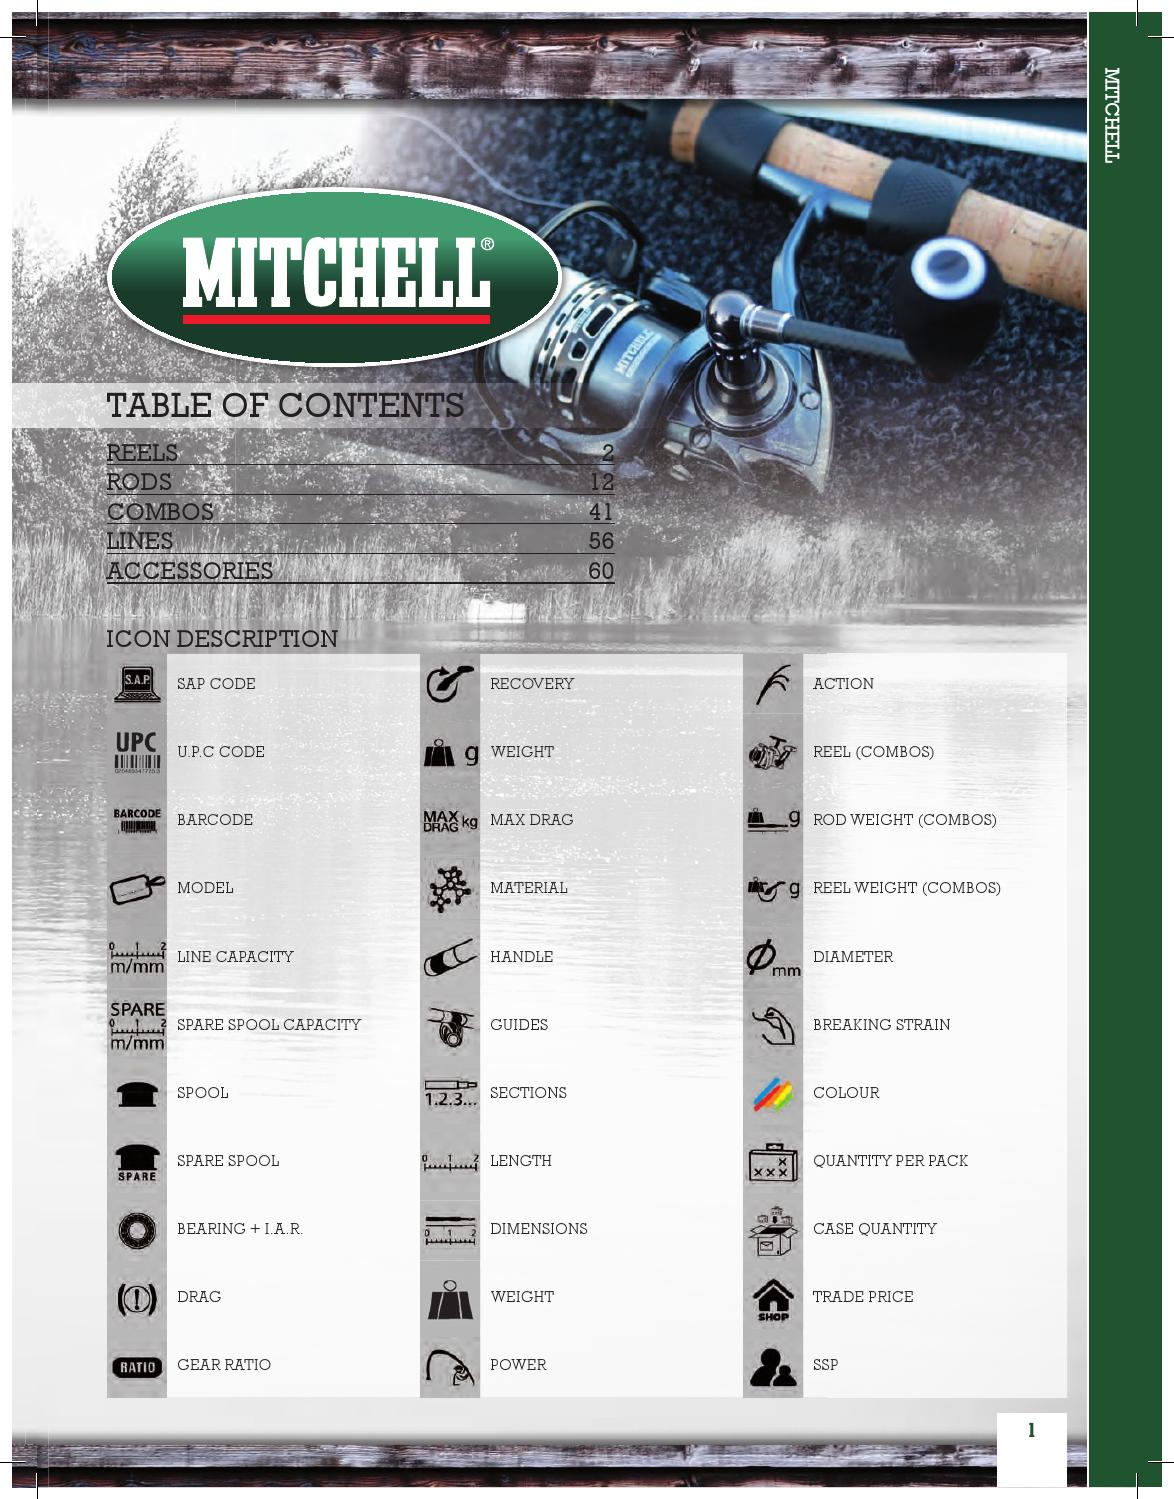 MITCHELL MAG PRO LITE EVX 732mh 12//40 SPIN 2,18m//12-40g SPINNING